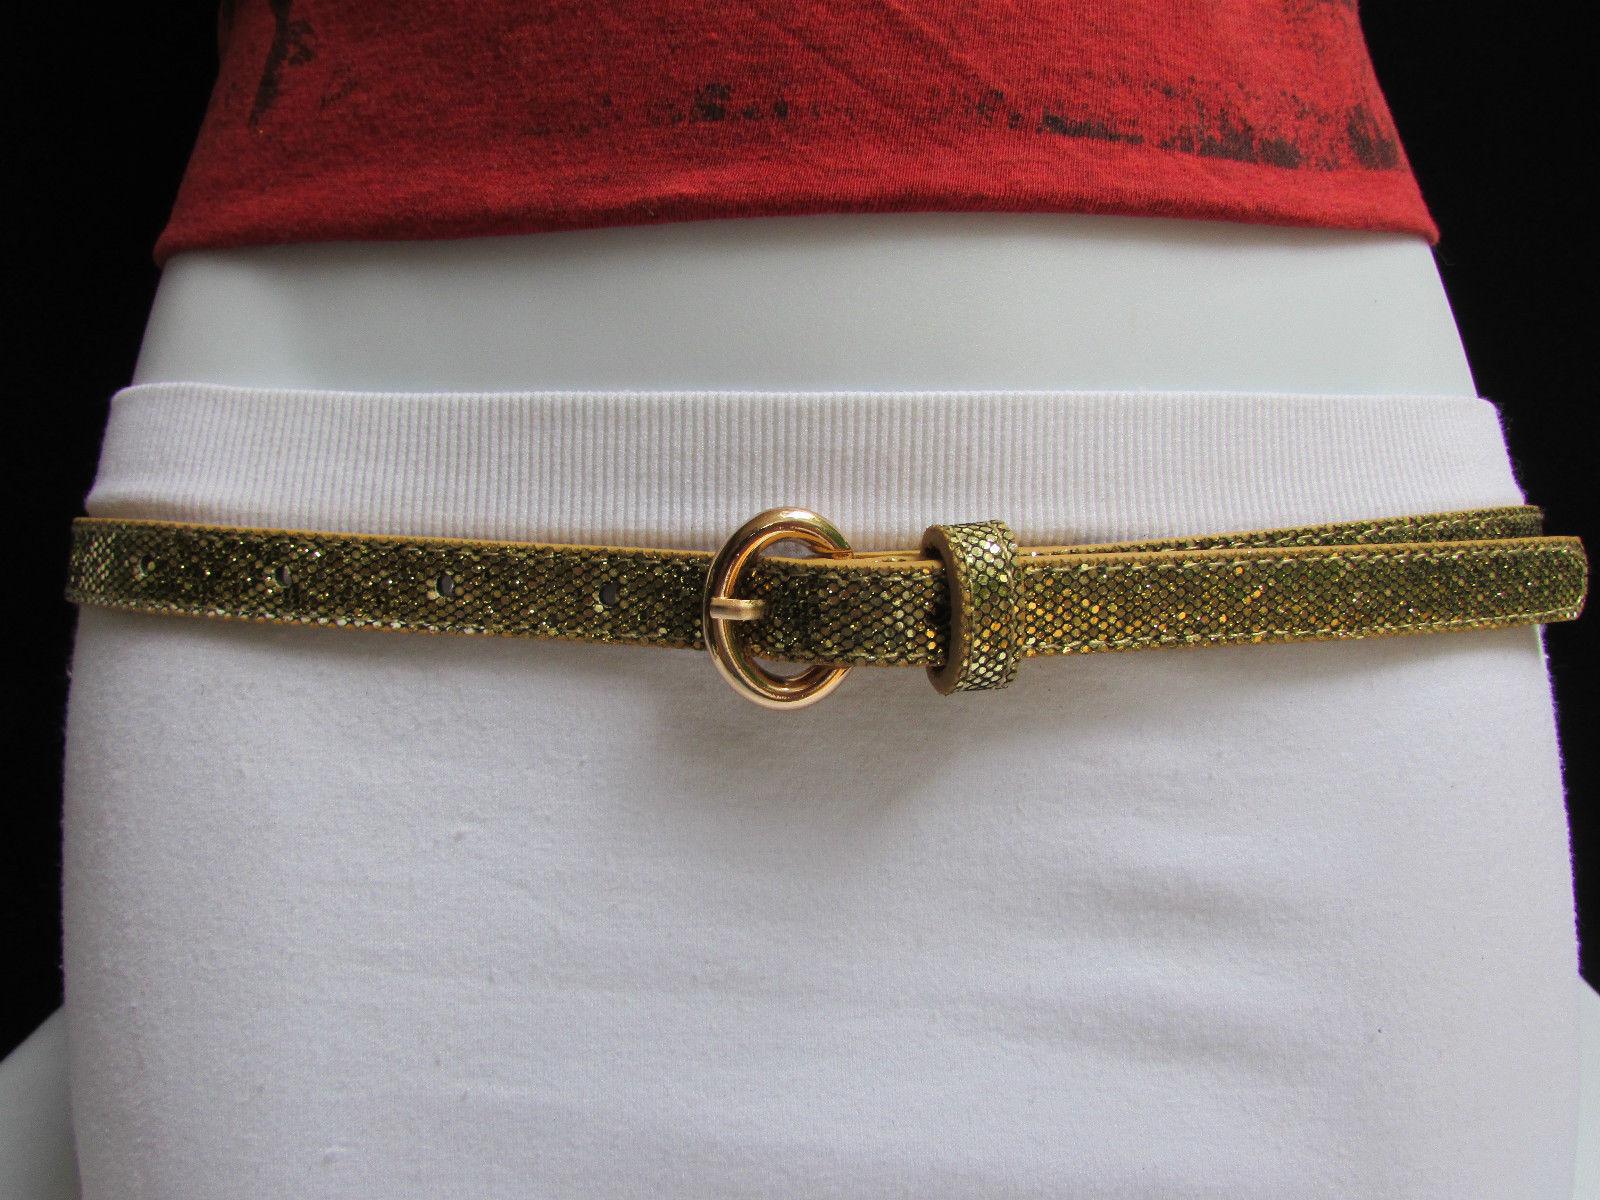 WOMEN HIGH WAIST HIP PINK NARROW FASHION BELT METAL GOLD BUCKLE SKINNY XS S M L